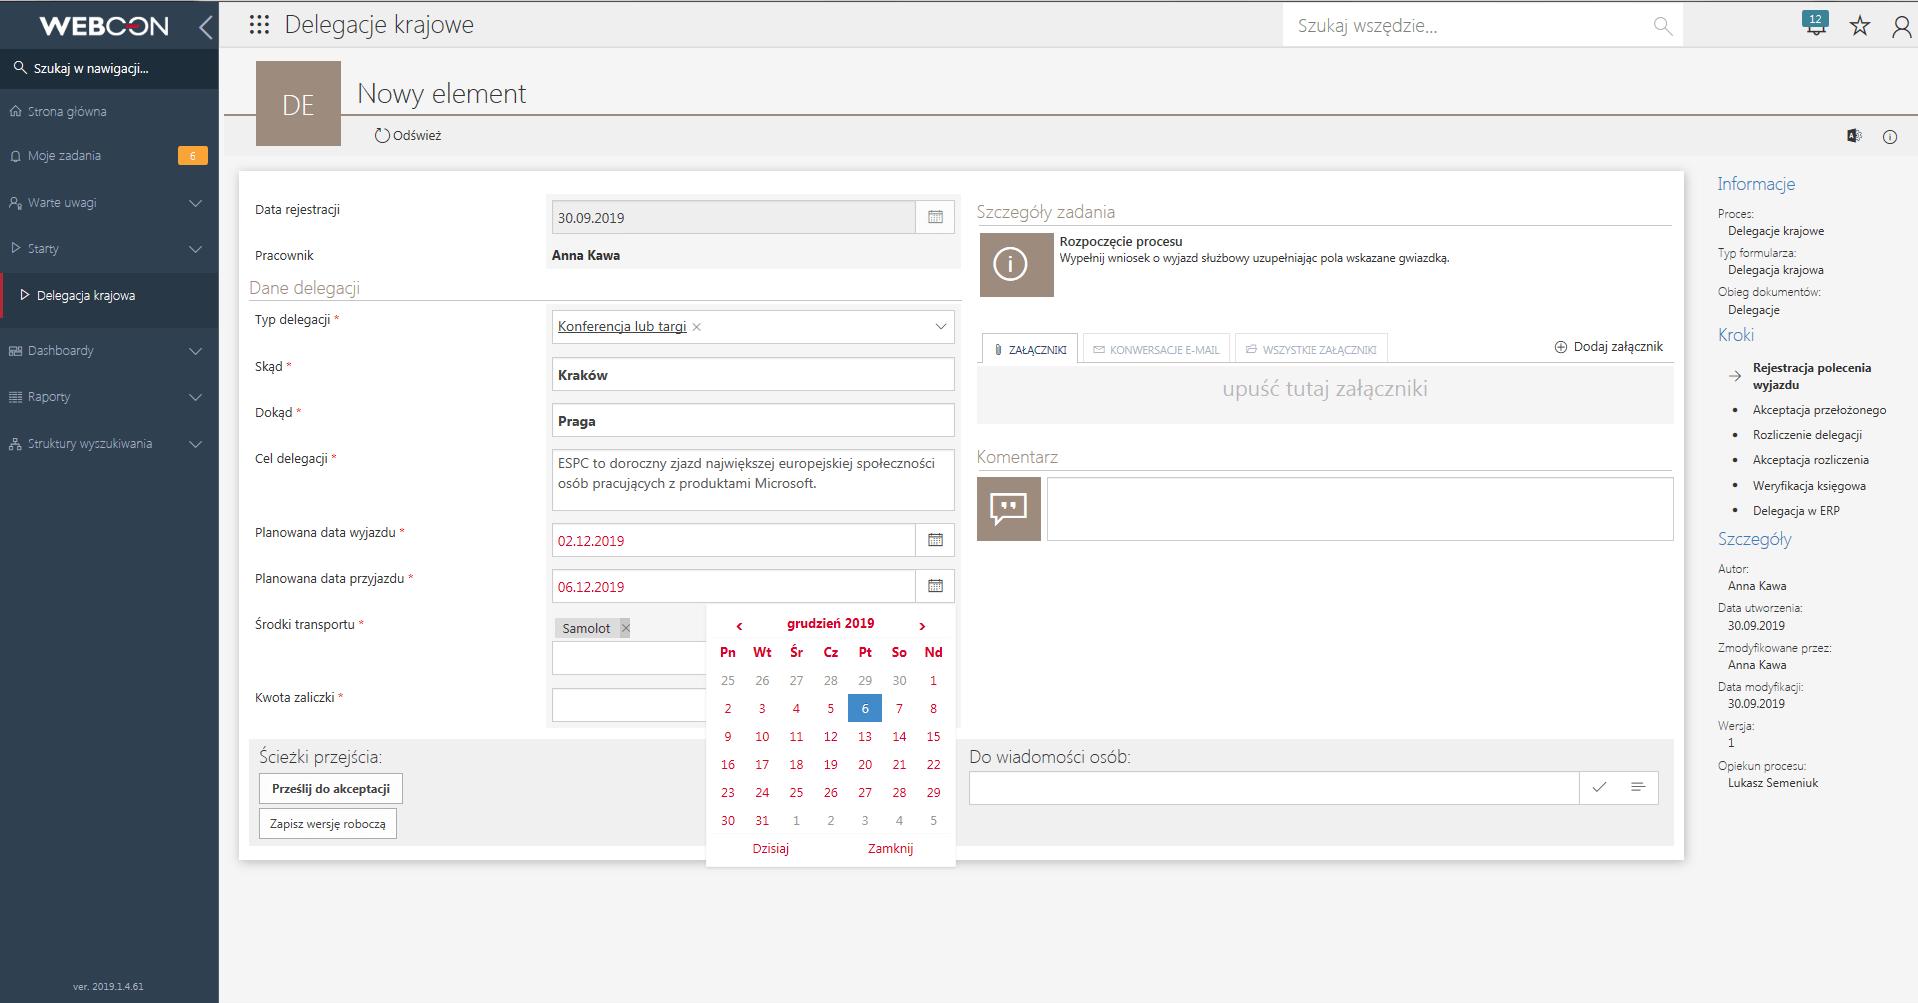 rejestracja delegacji w WEBCON BPS